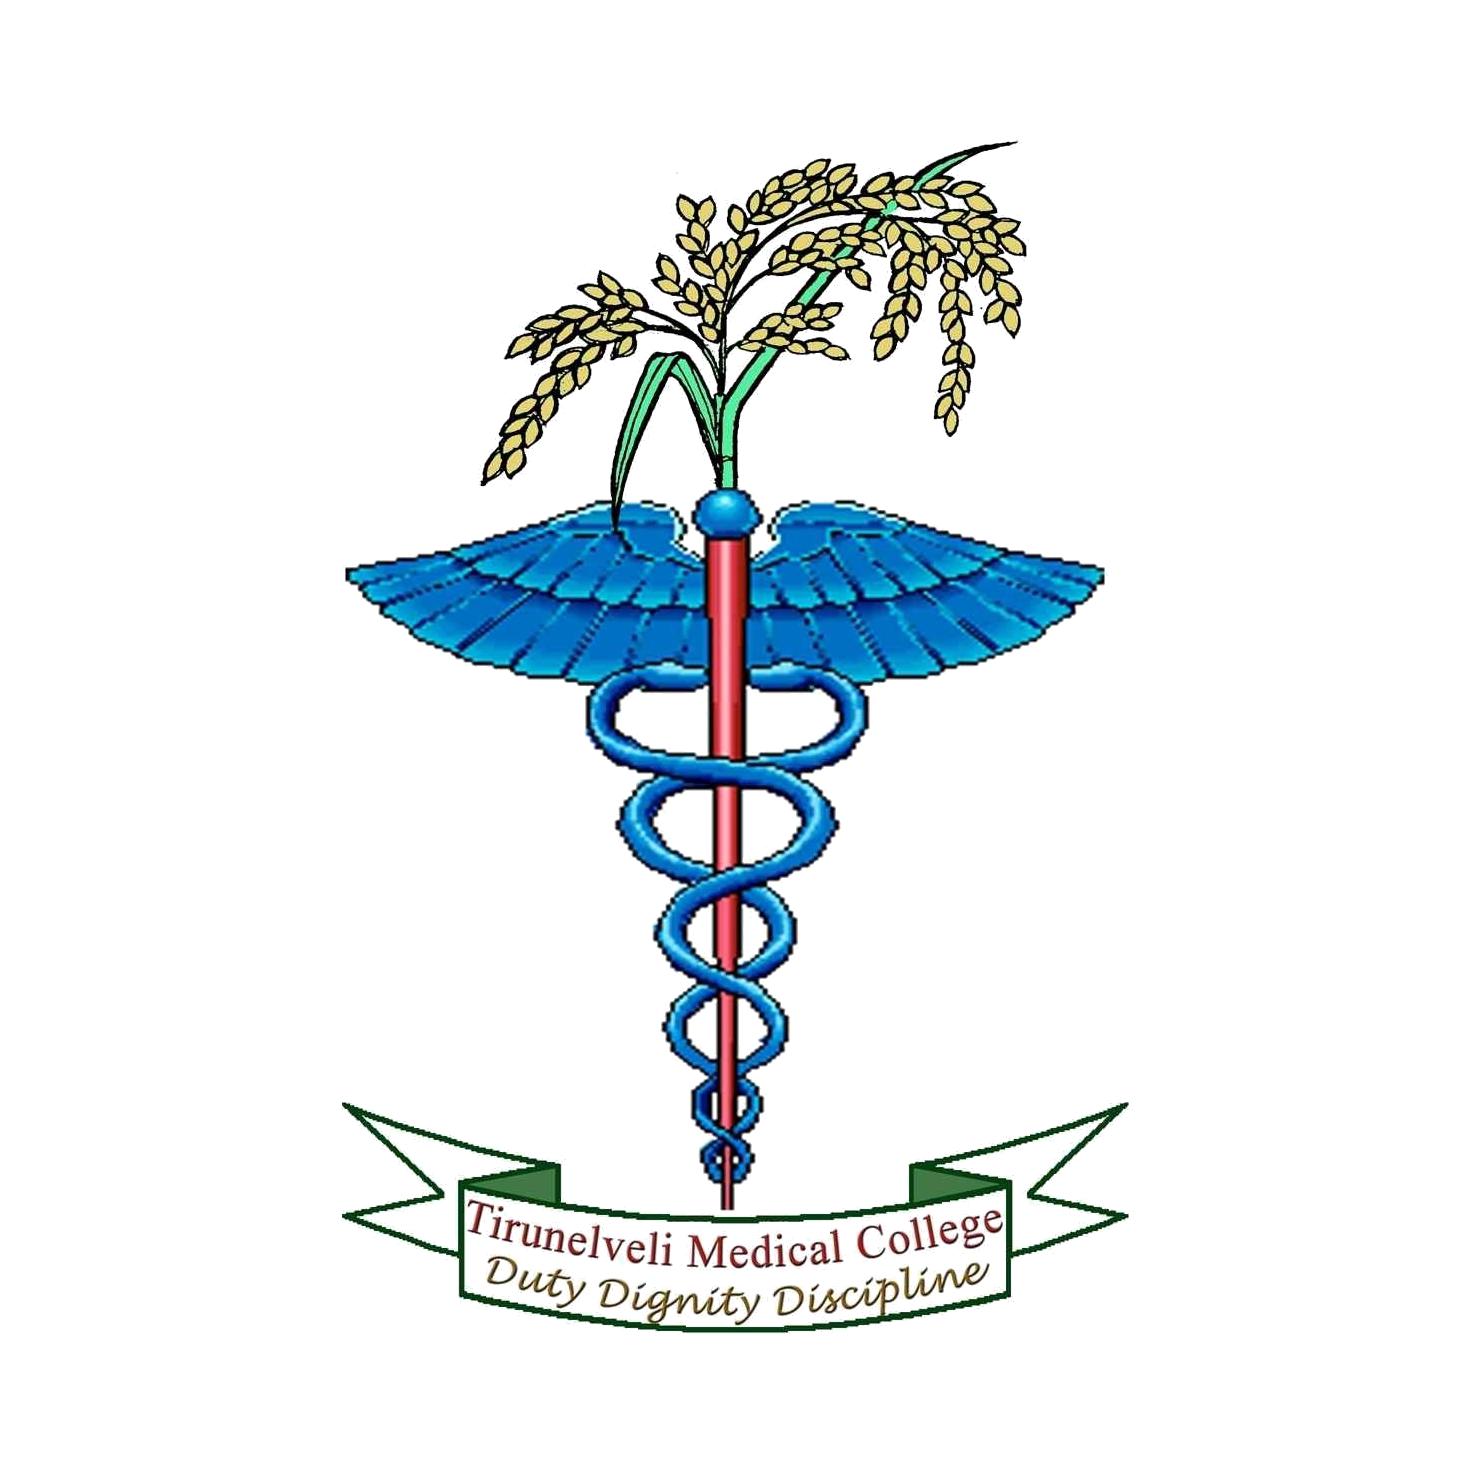 Tirunelveli Medical College